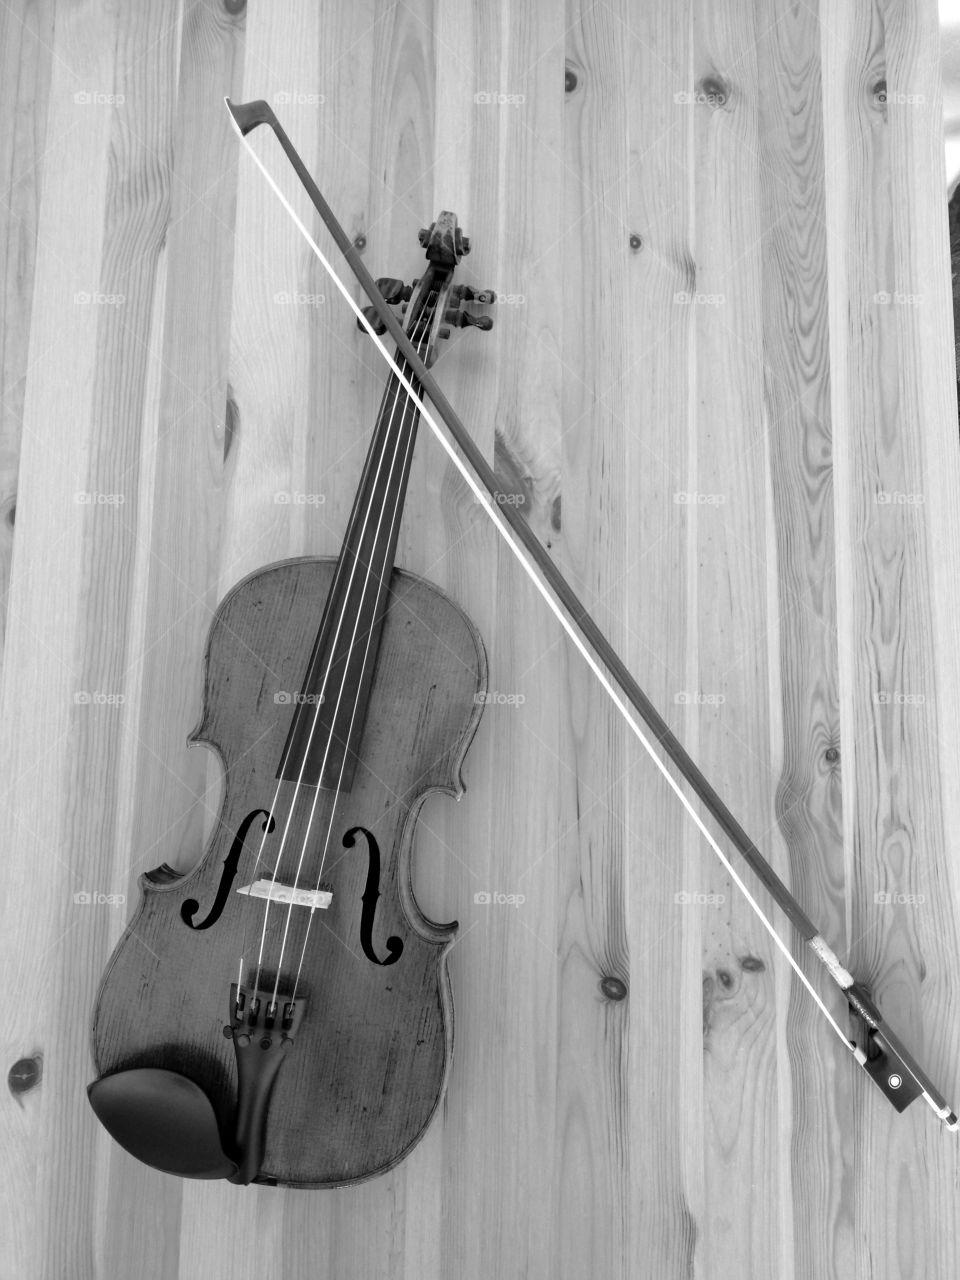 blach and white violin II